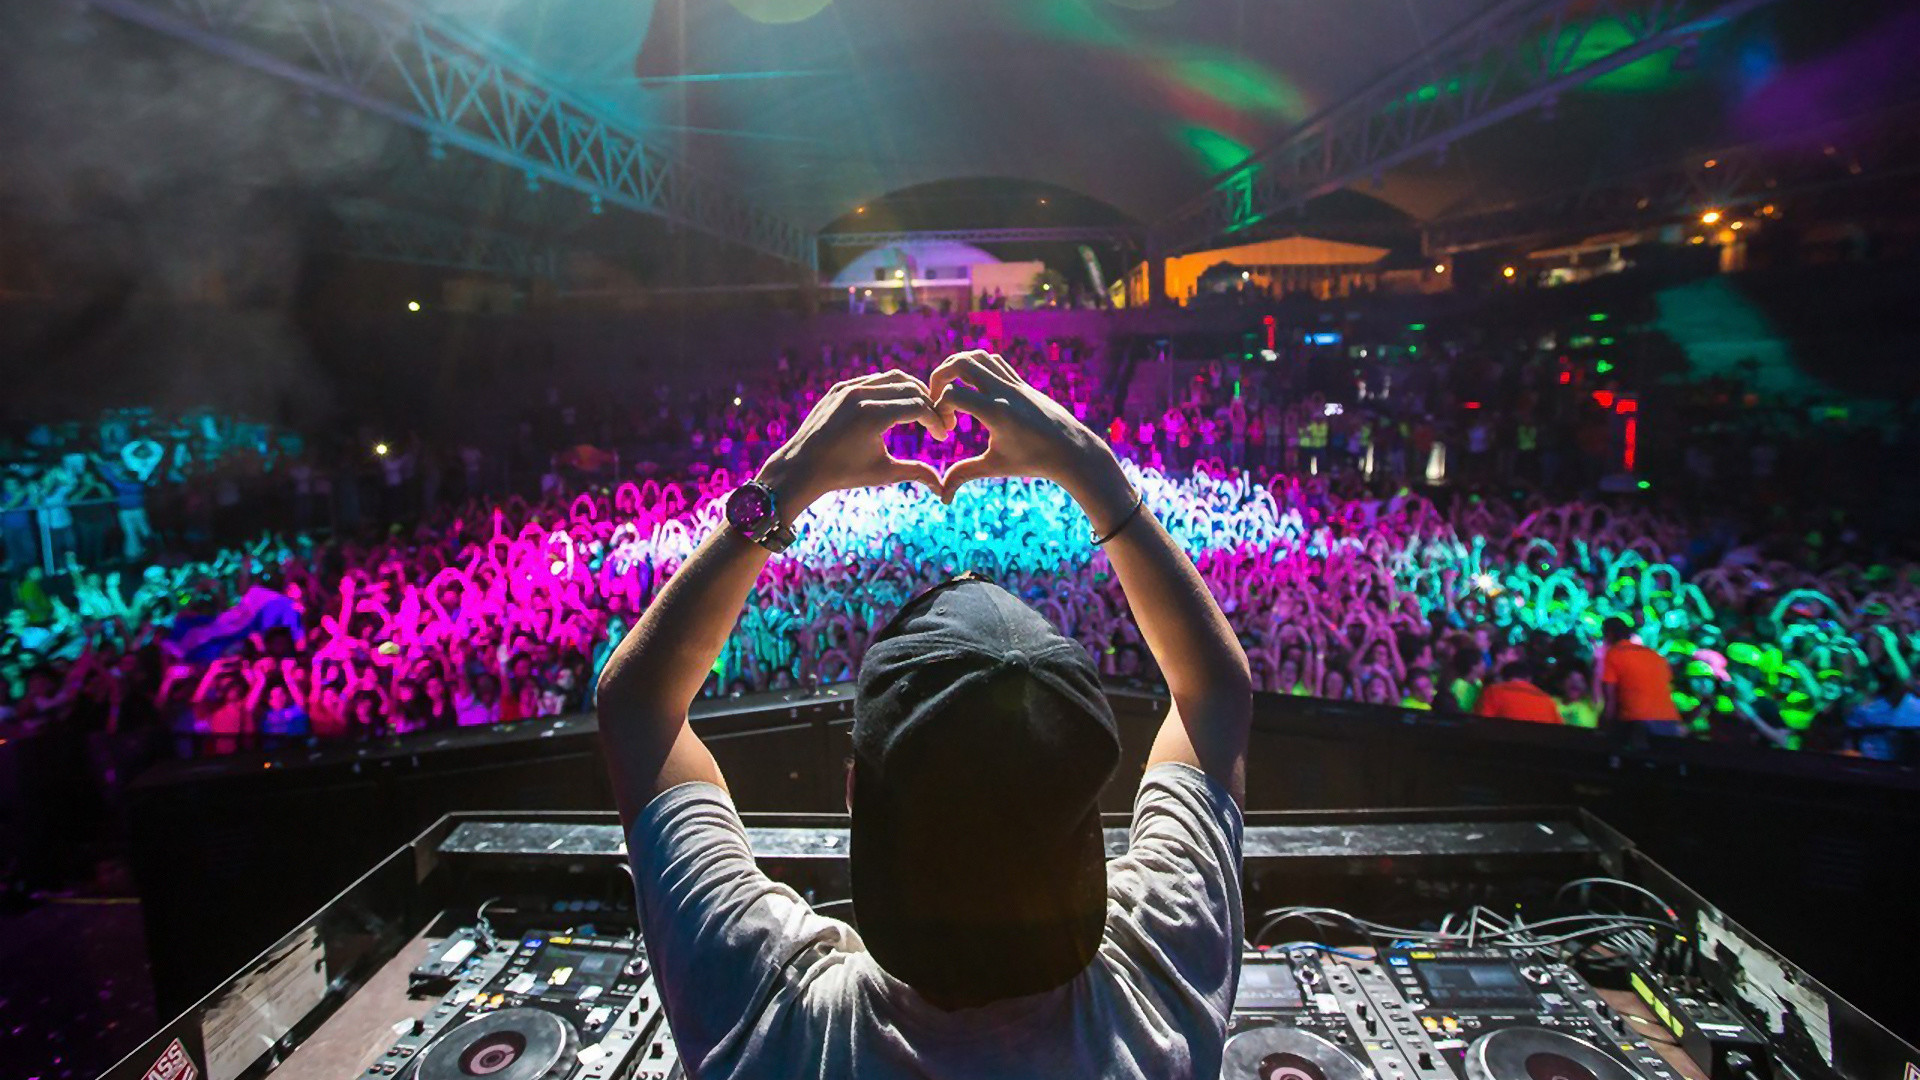 Wallpaper Avicii, DJ, Heart, Crowd desktop wallpaper » Music .